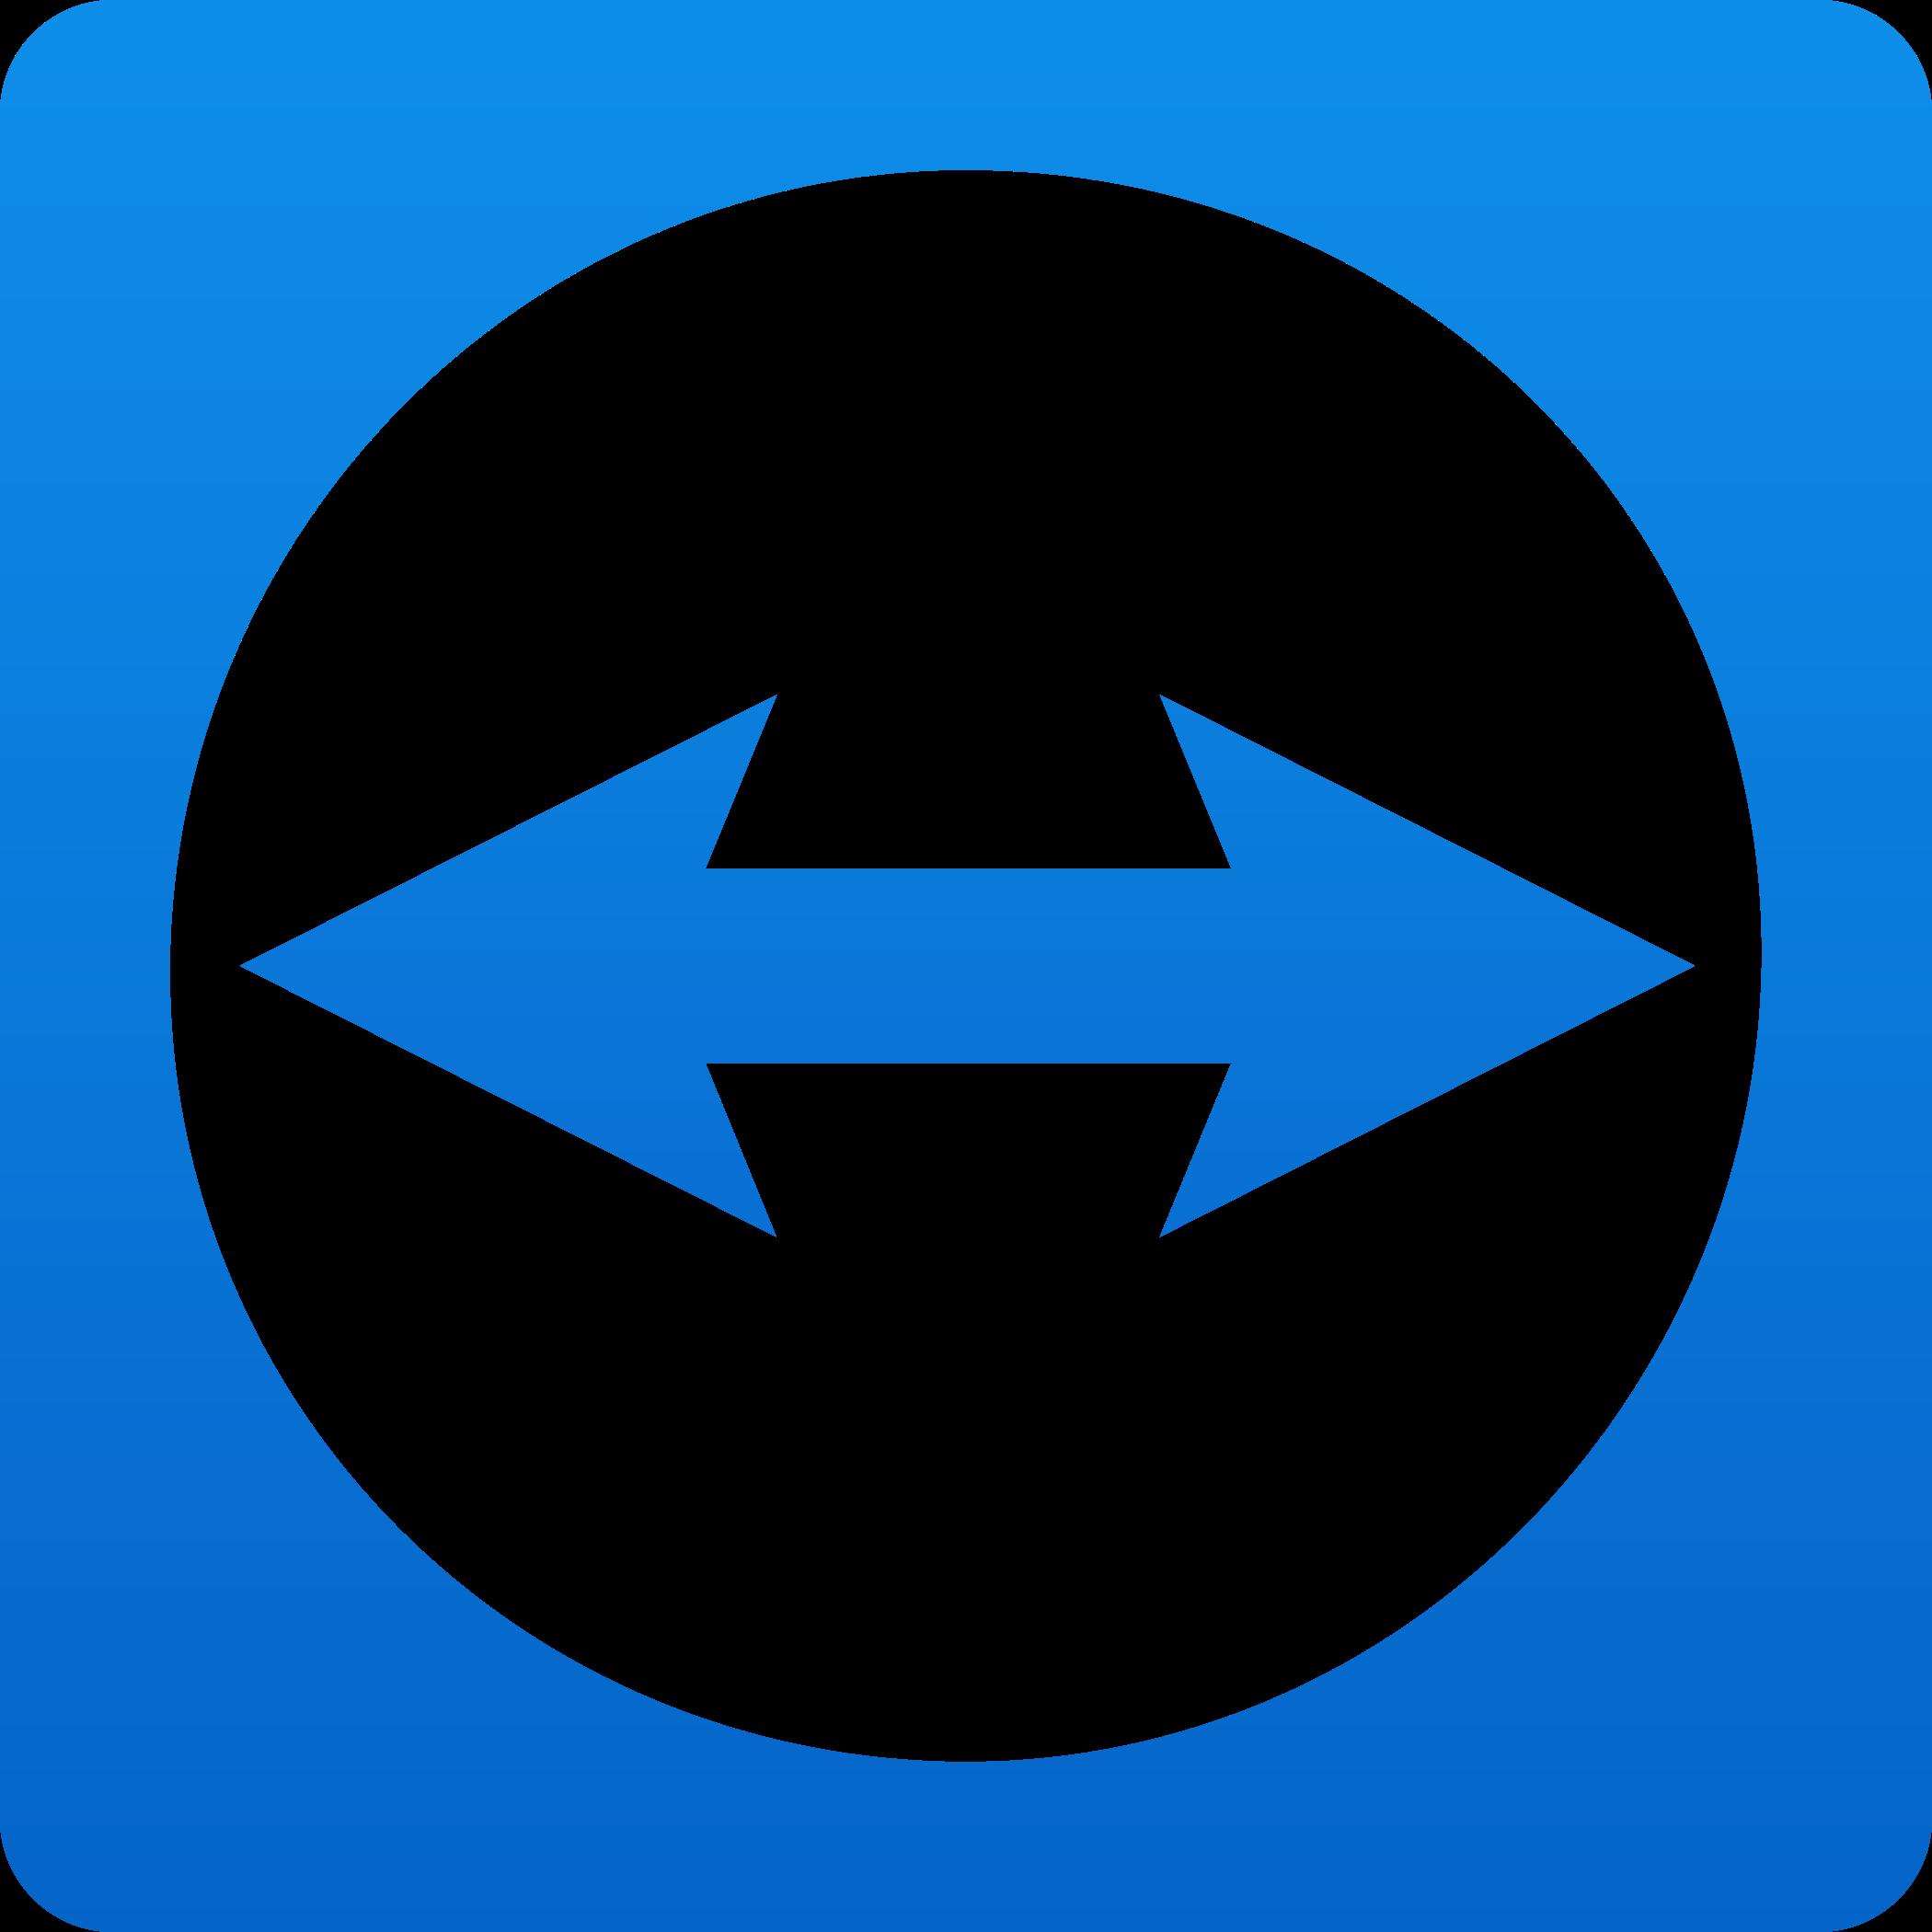 teamviewer-logo-3